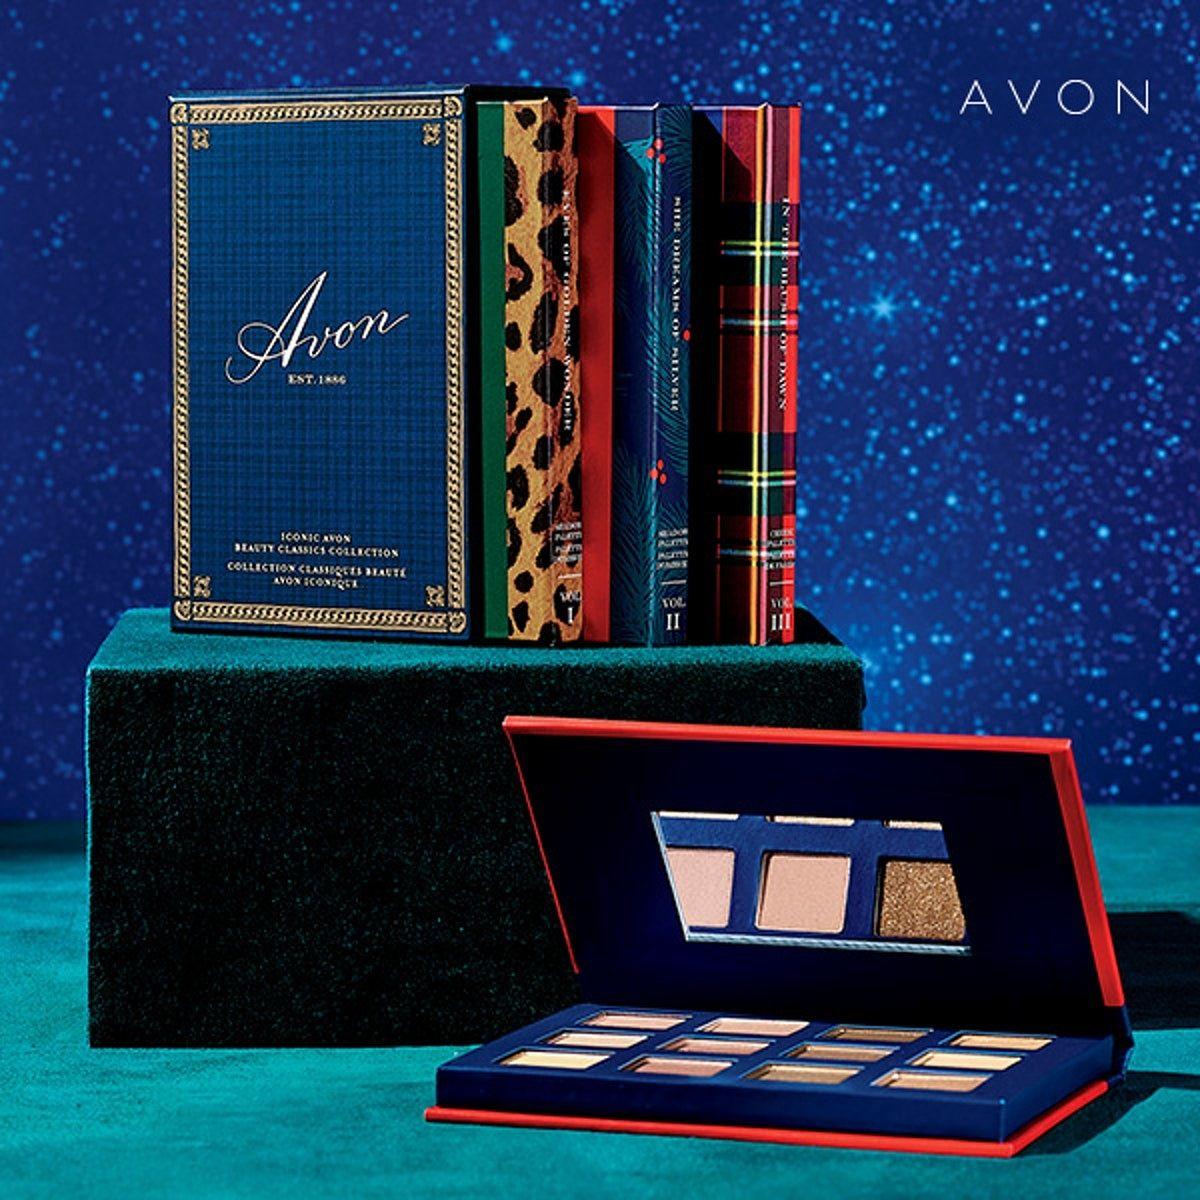 Avon beauty, Avon, Shadow